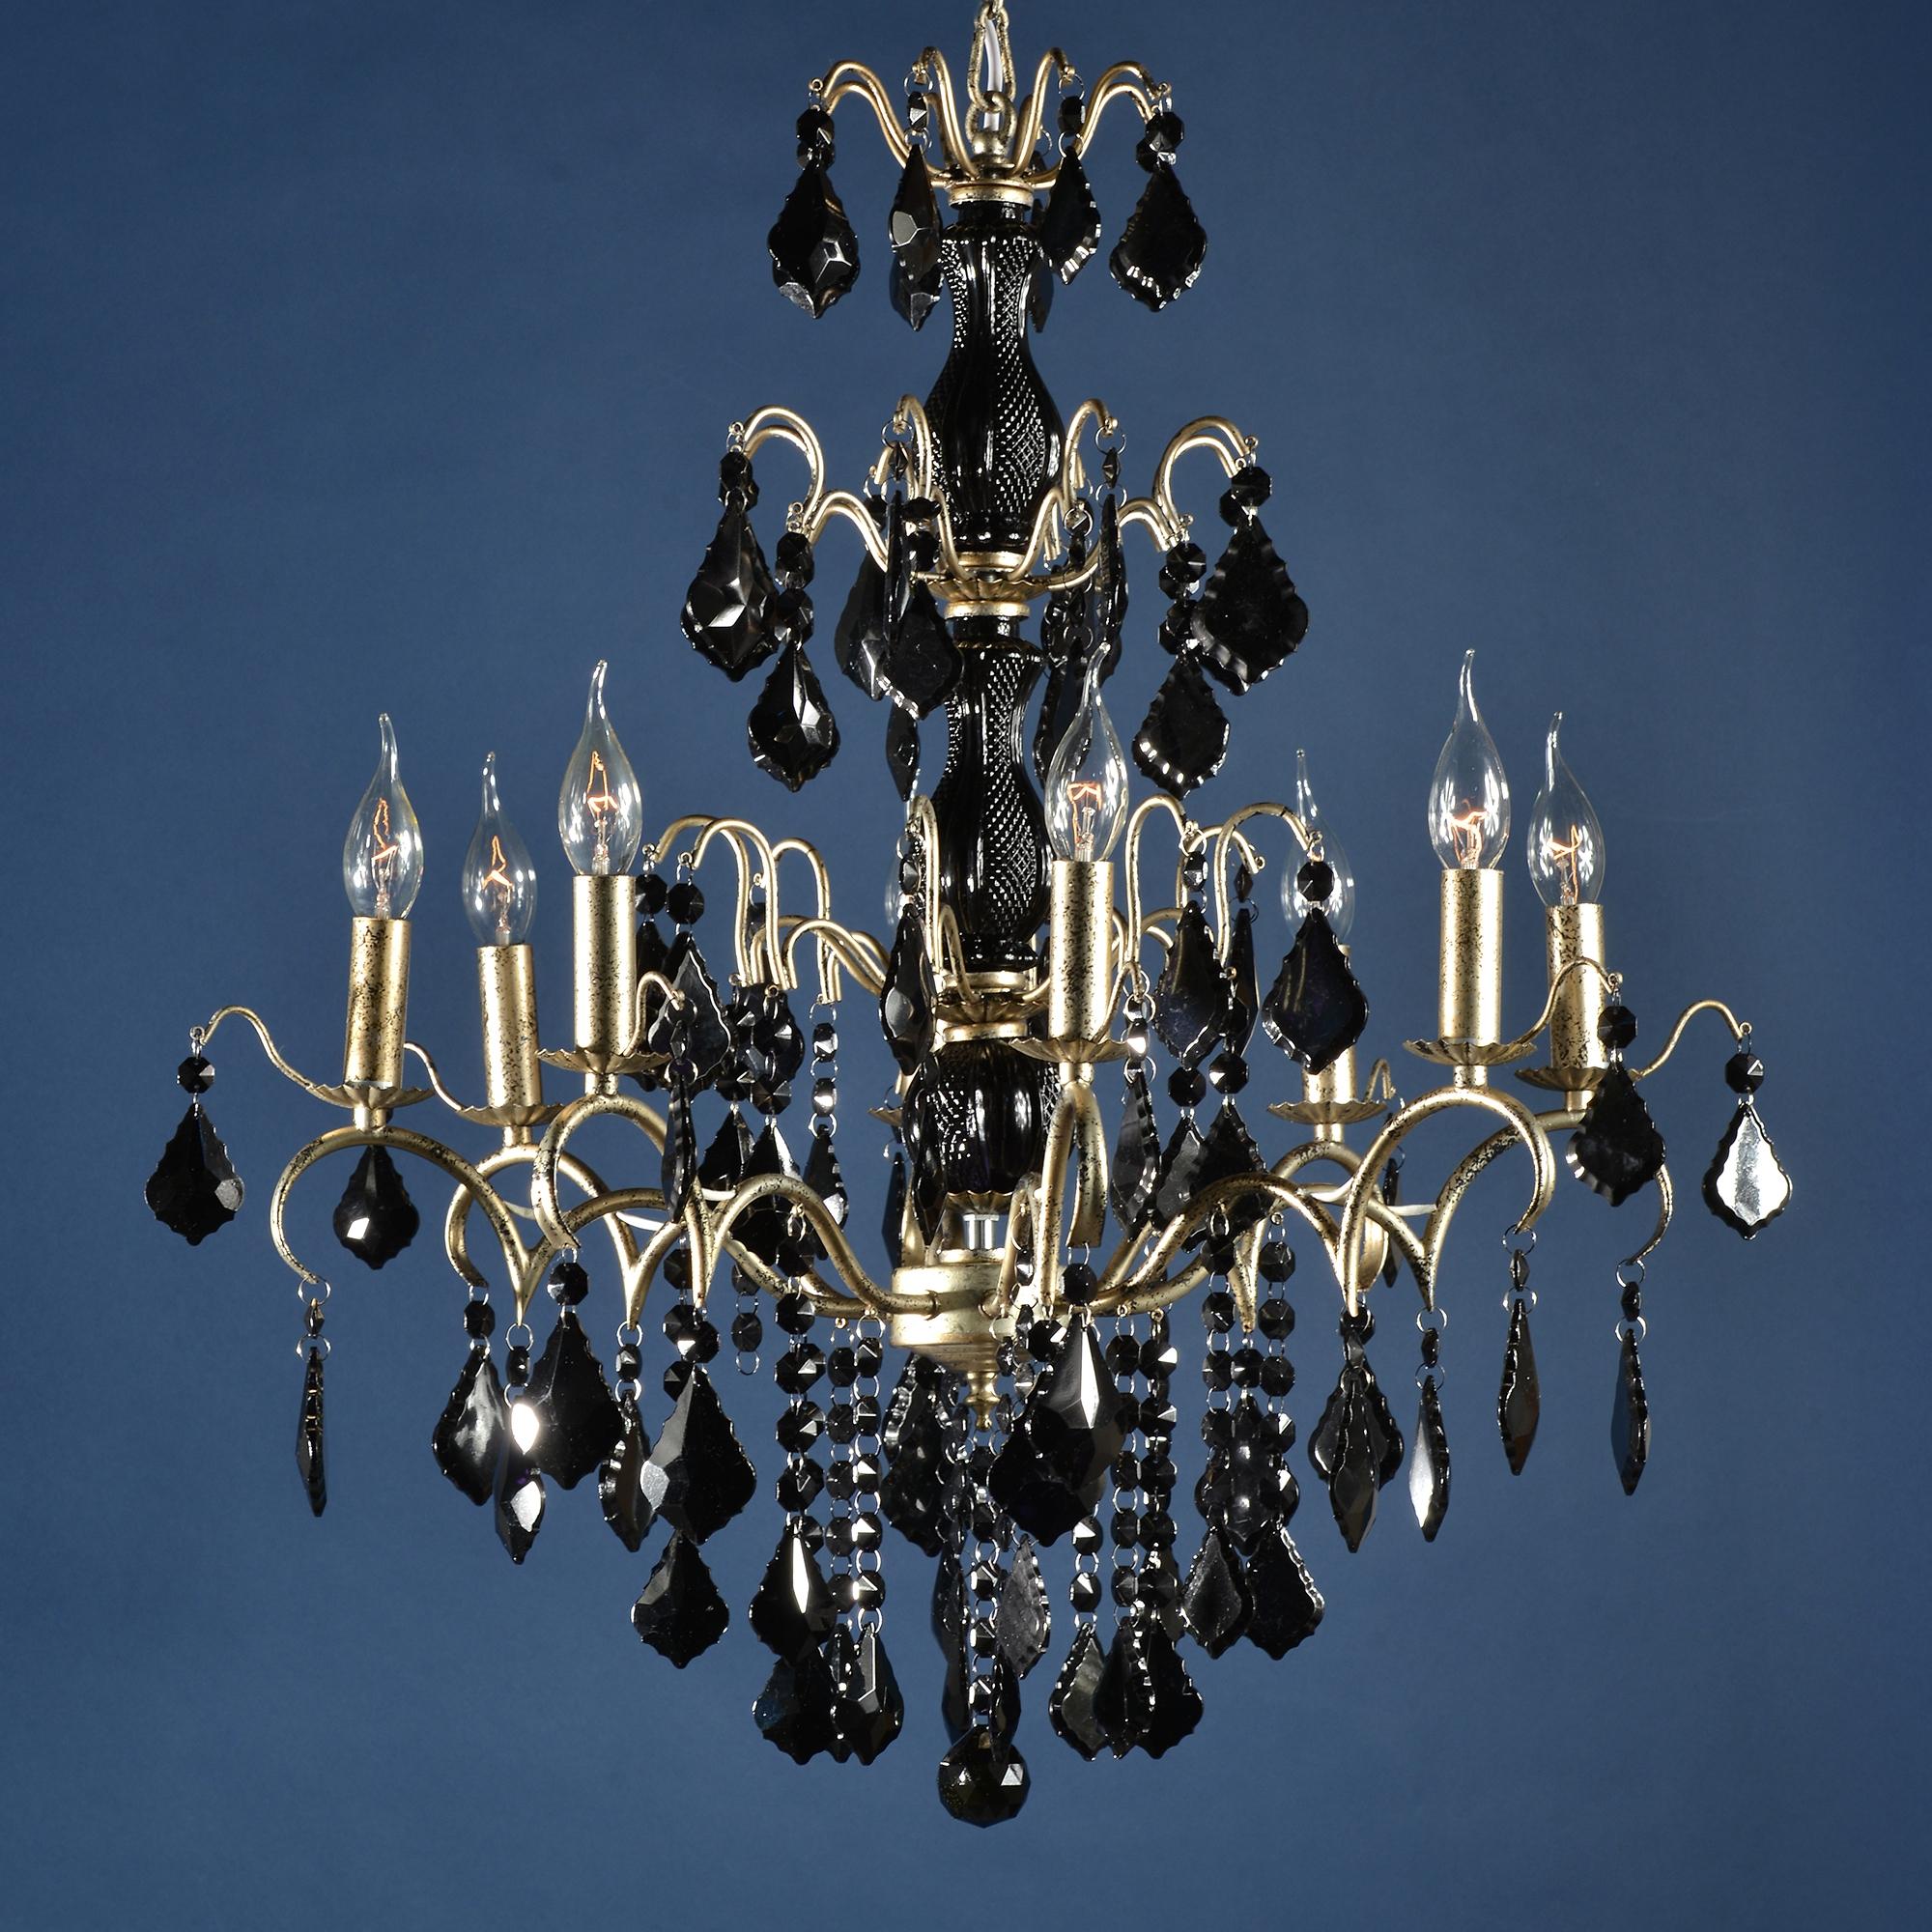 Charlotte 8 Light Chandelier - Silver and Black